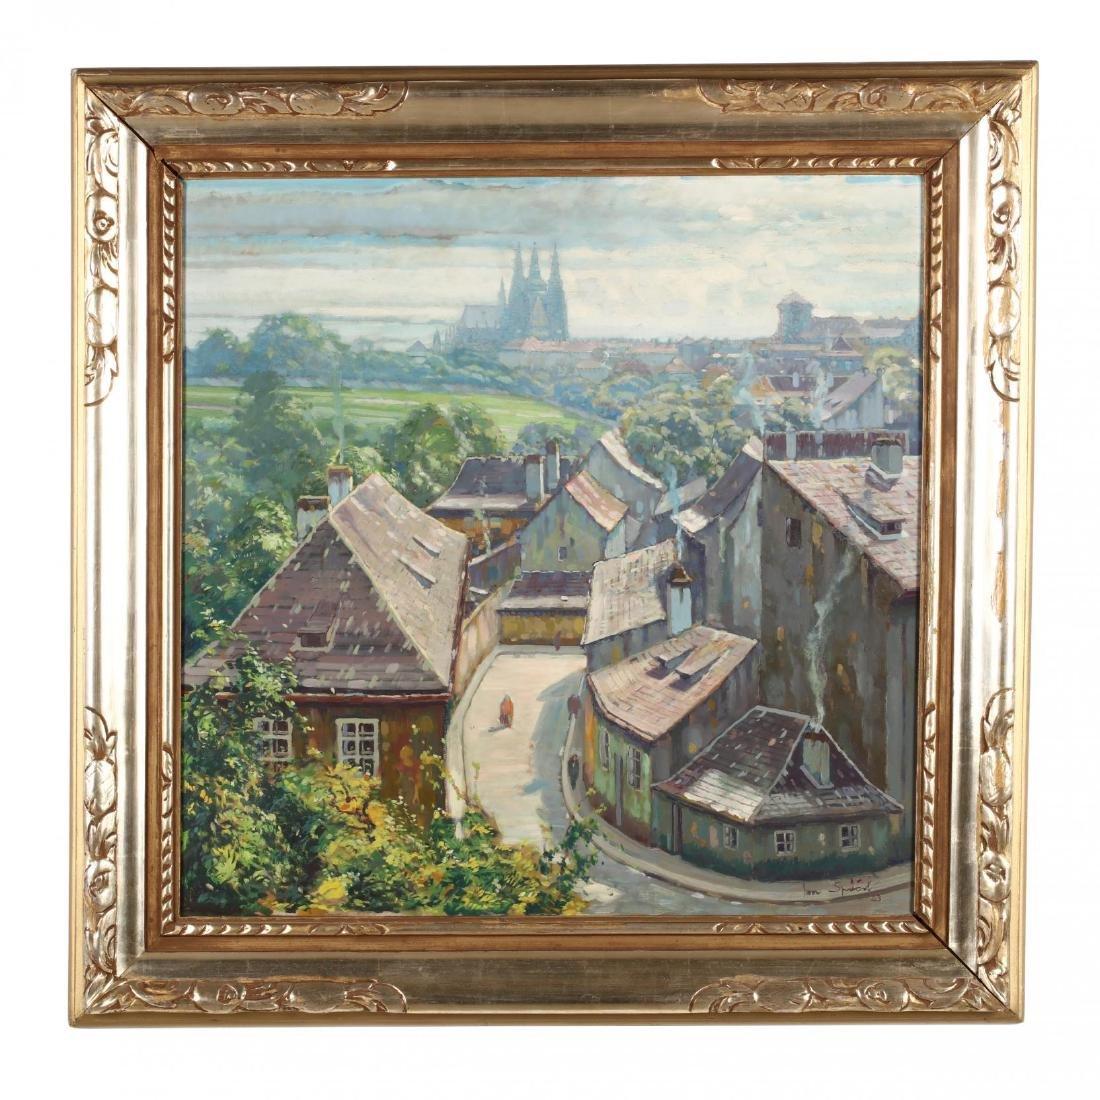 Jan Spacil-Zeranovsky (Czech, 1892-1982), View of